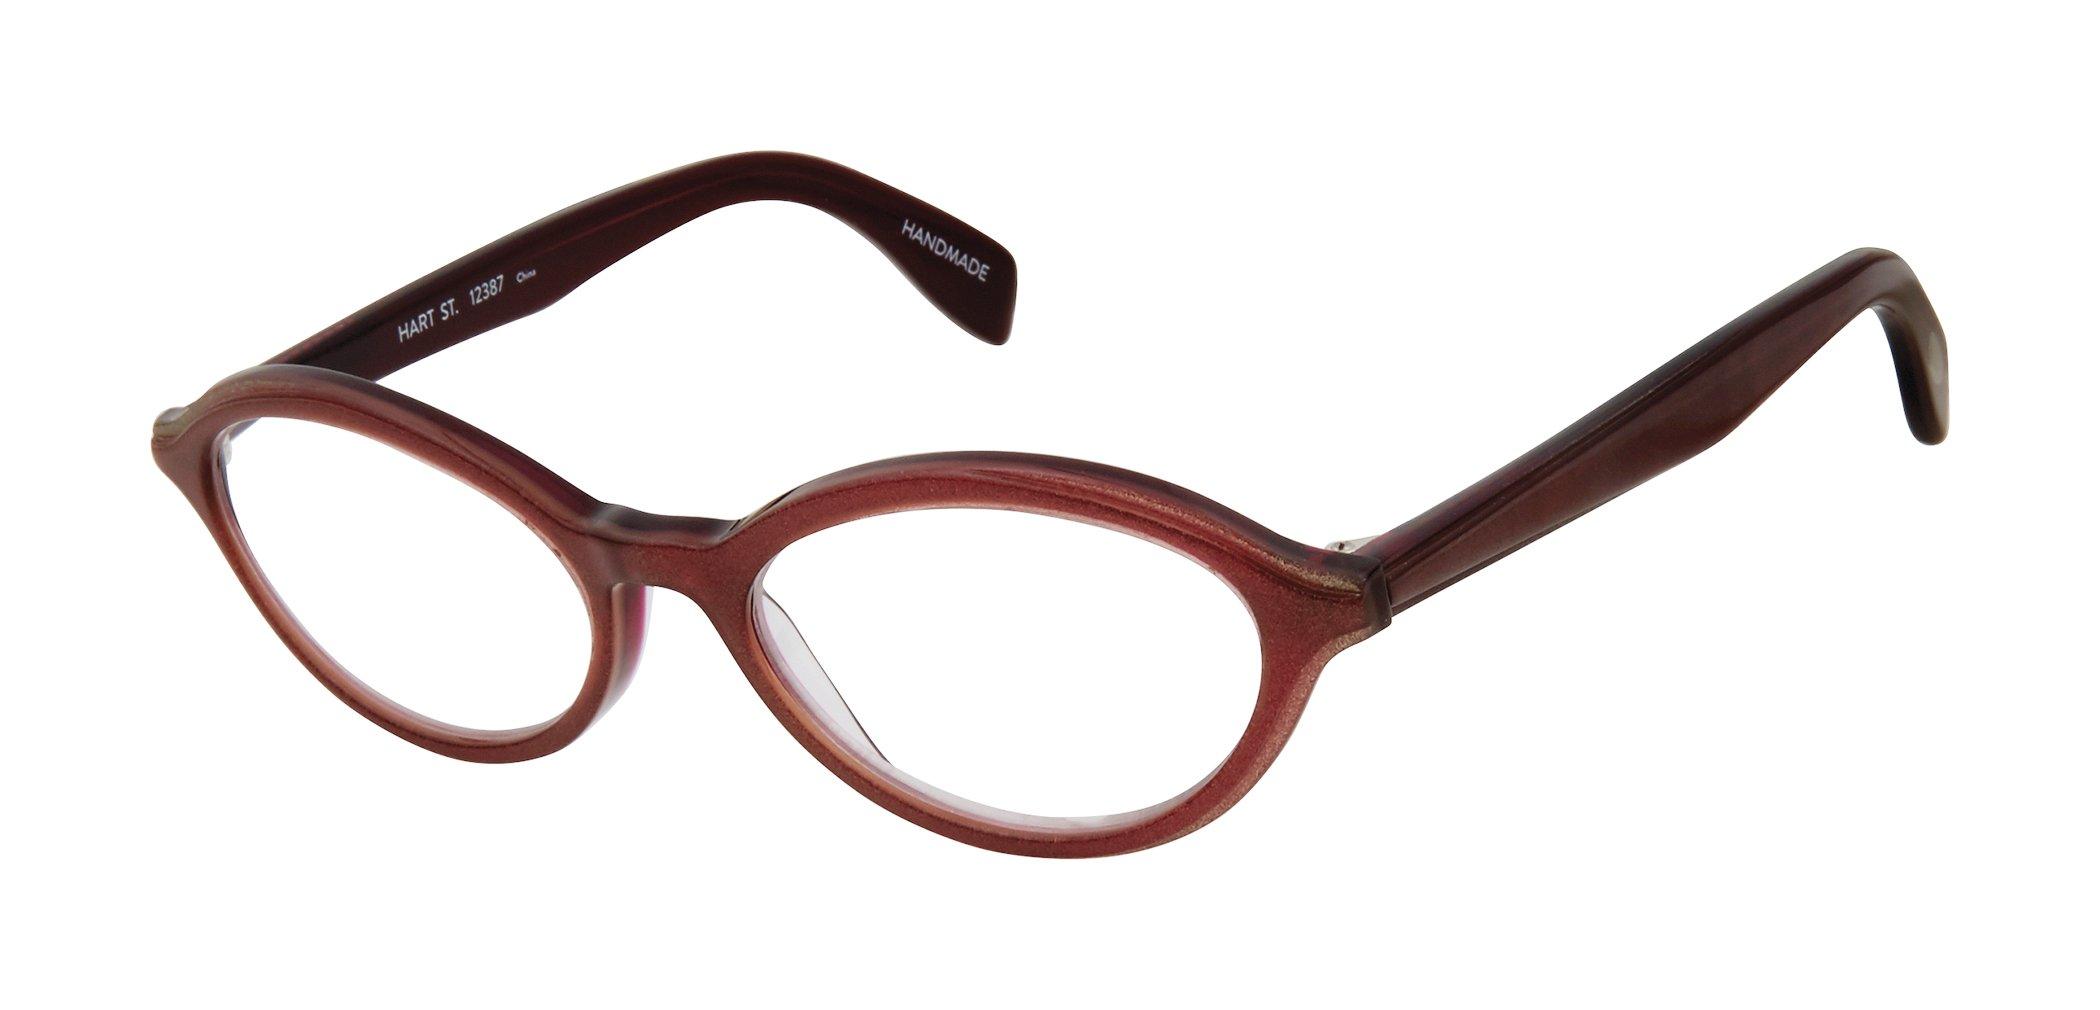 Hart Street - Oval Trendy Fashion Reading Glasses for Men and Women - Sangria Shimmer